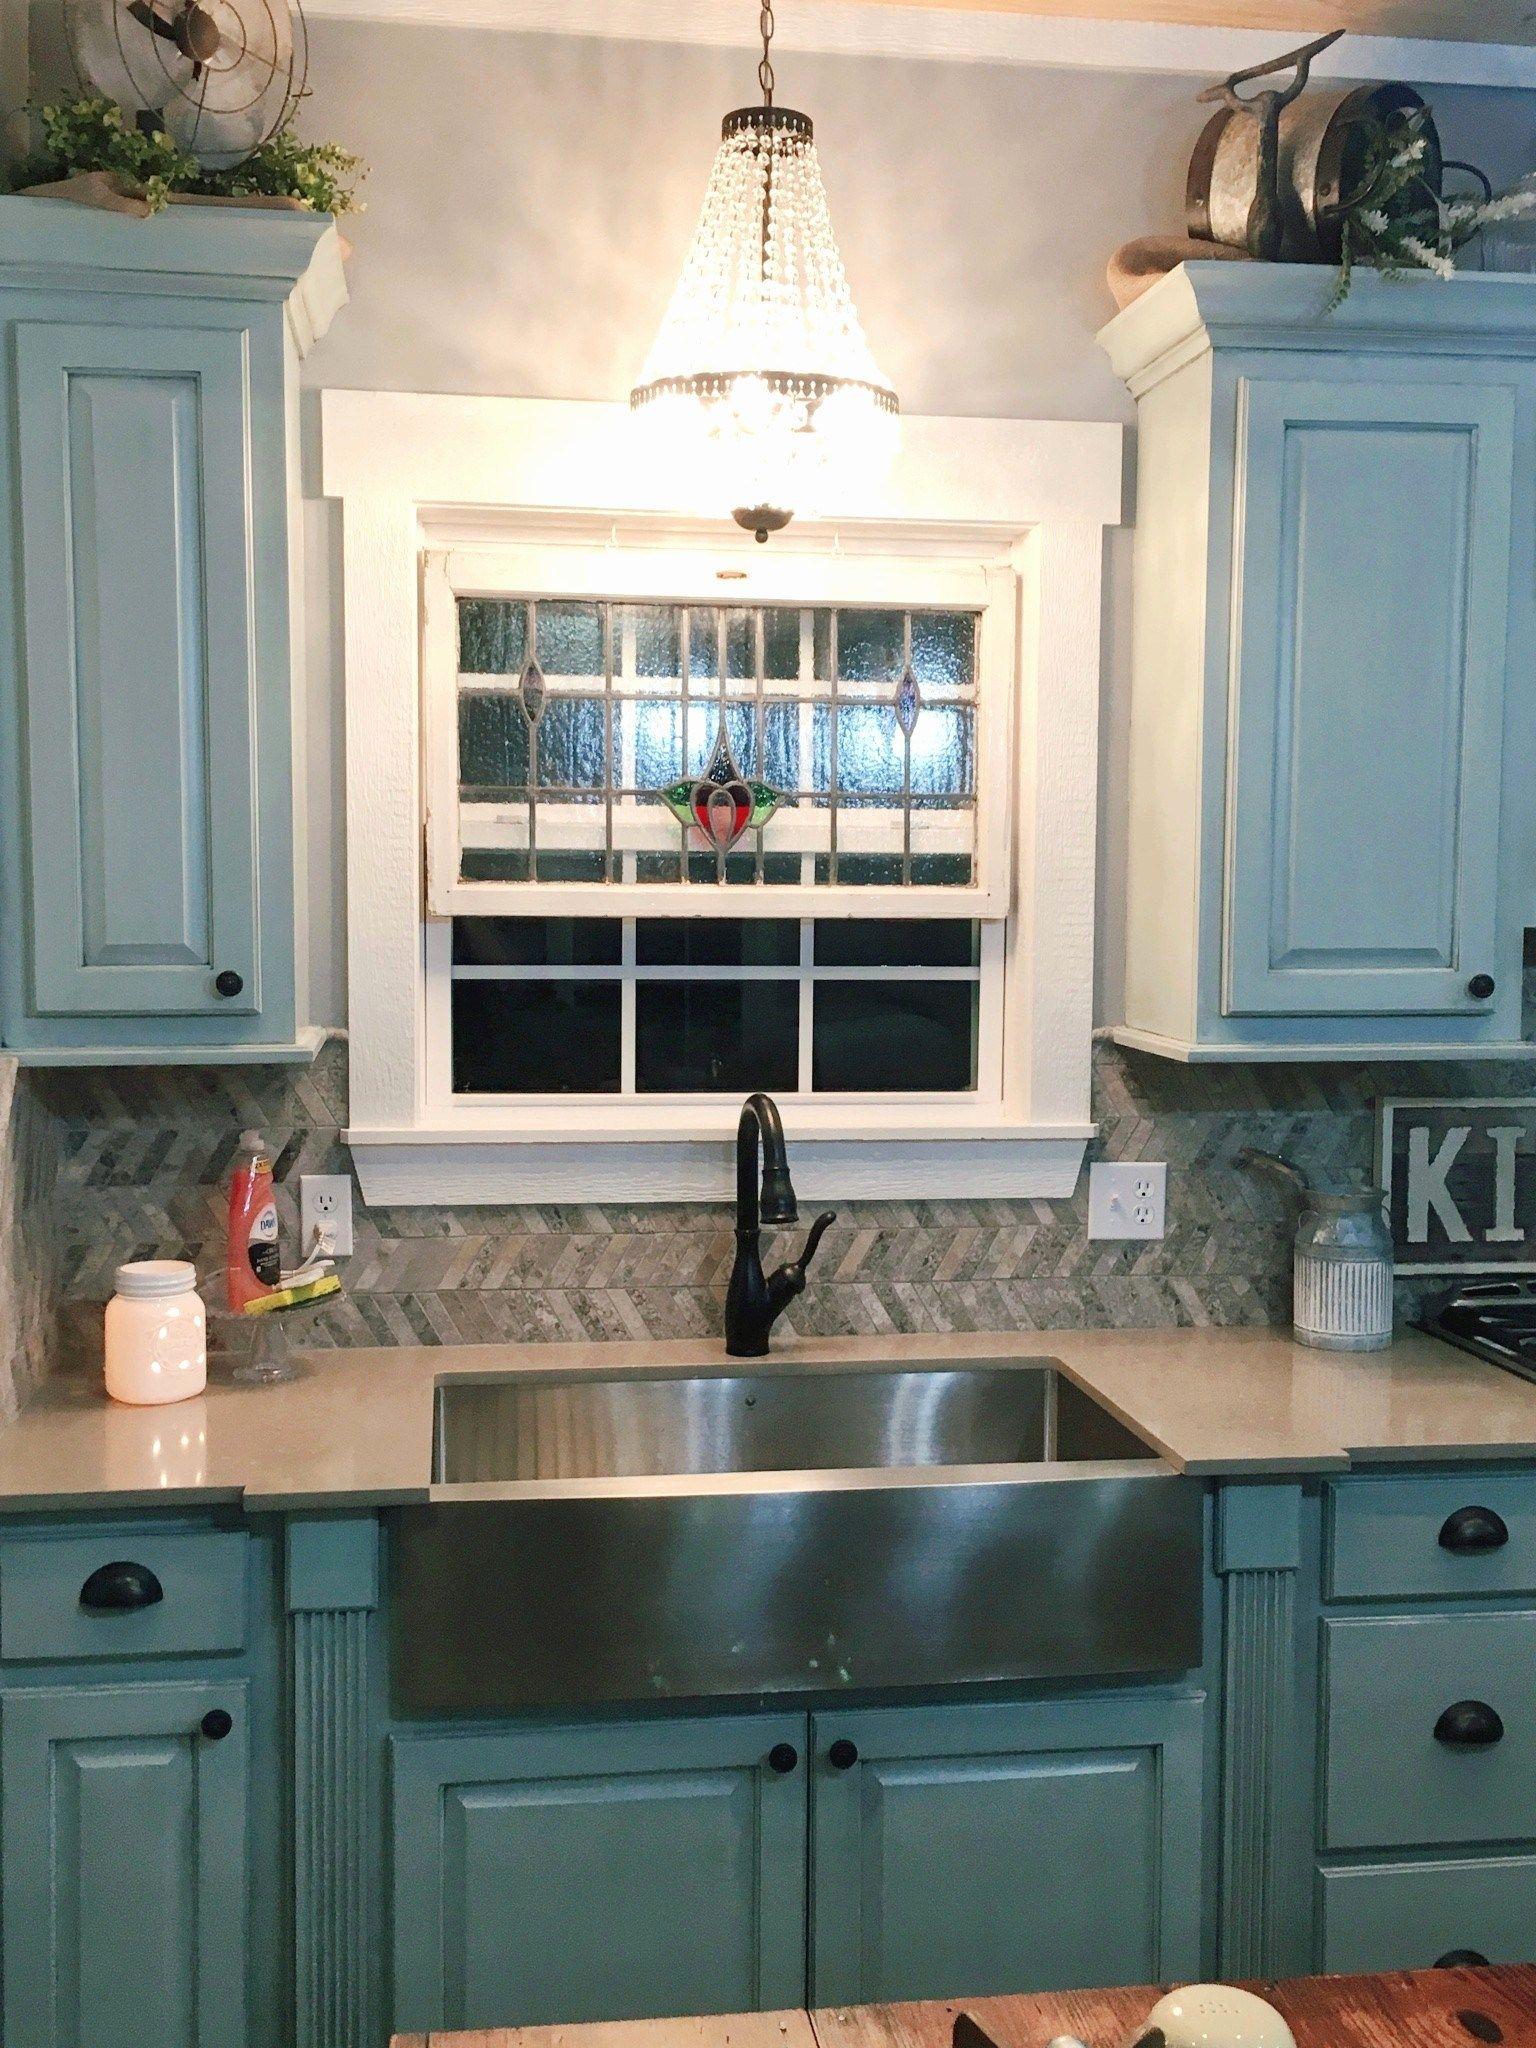 25 Beautiful Pendant Light Over Kitchen Sink Country Kitchen Restaurant Country Kitchen Backsplash Farmhouse Kitchen Backsplash